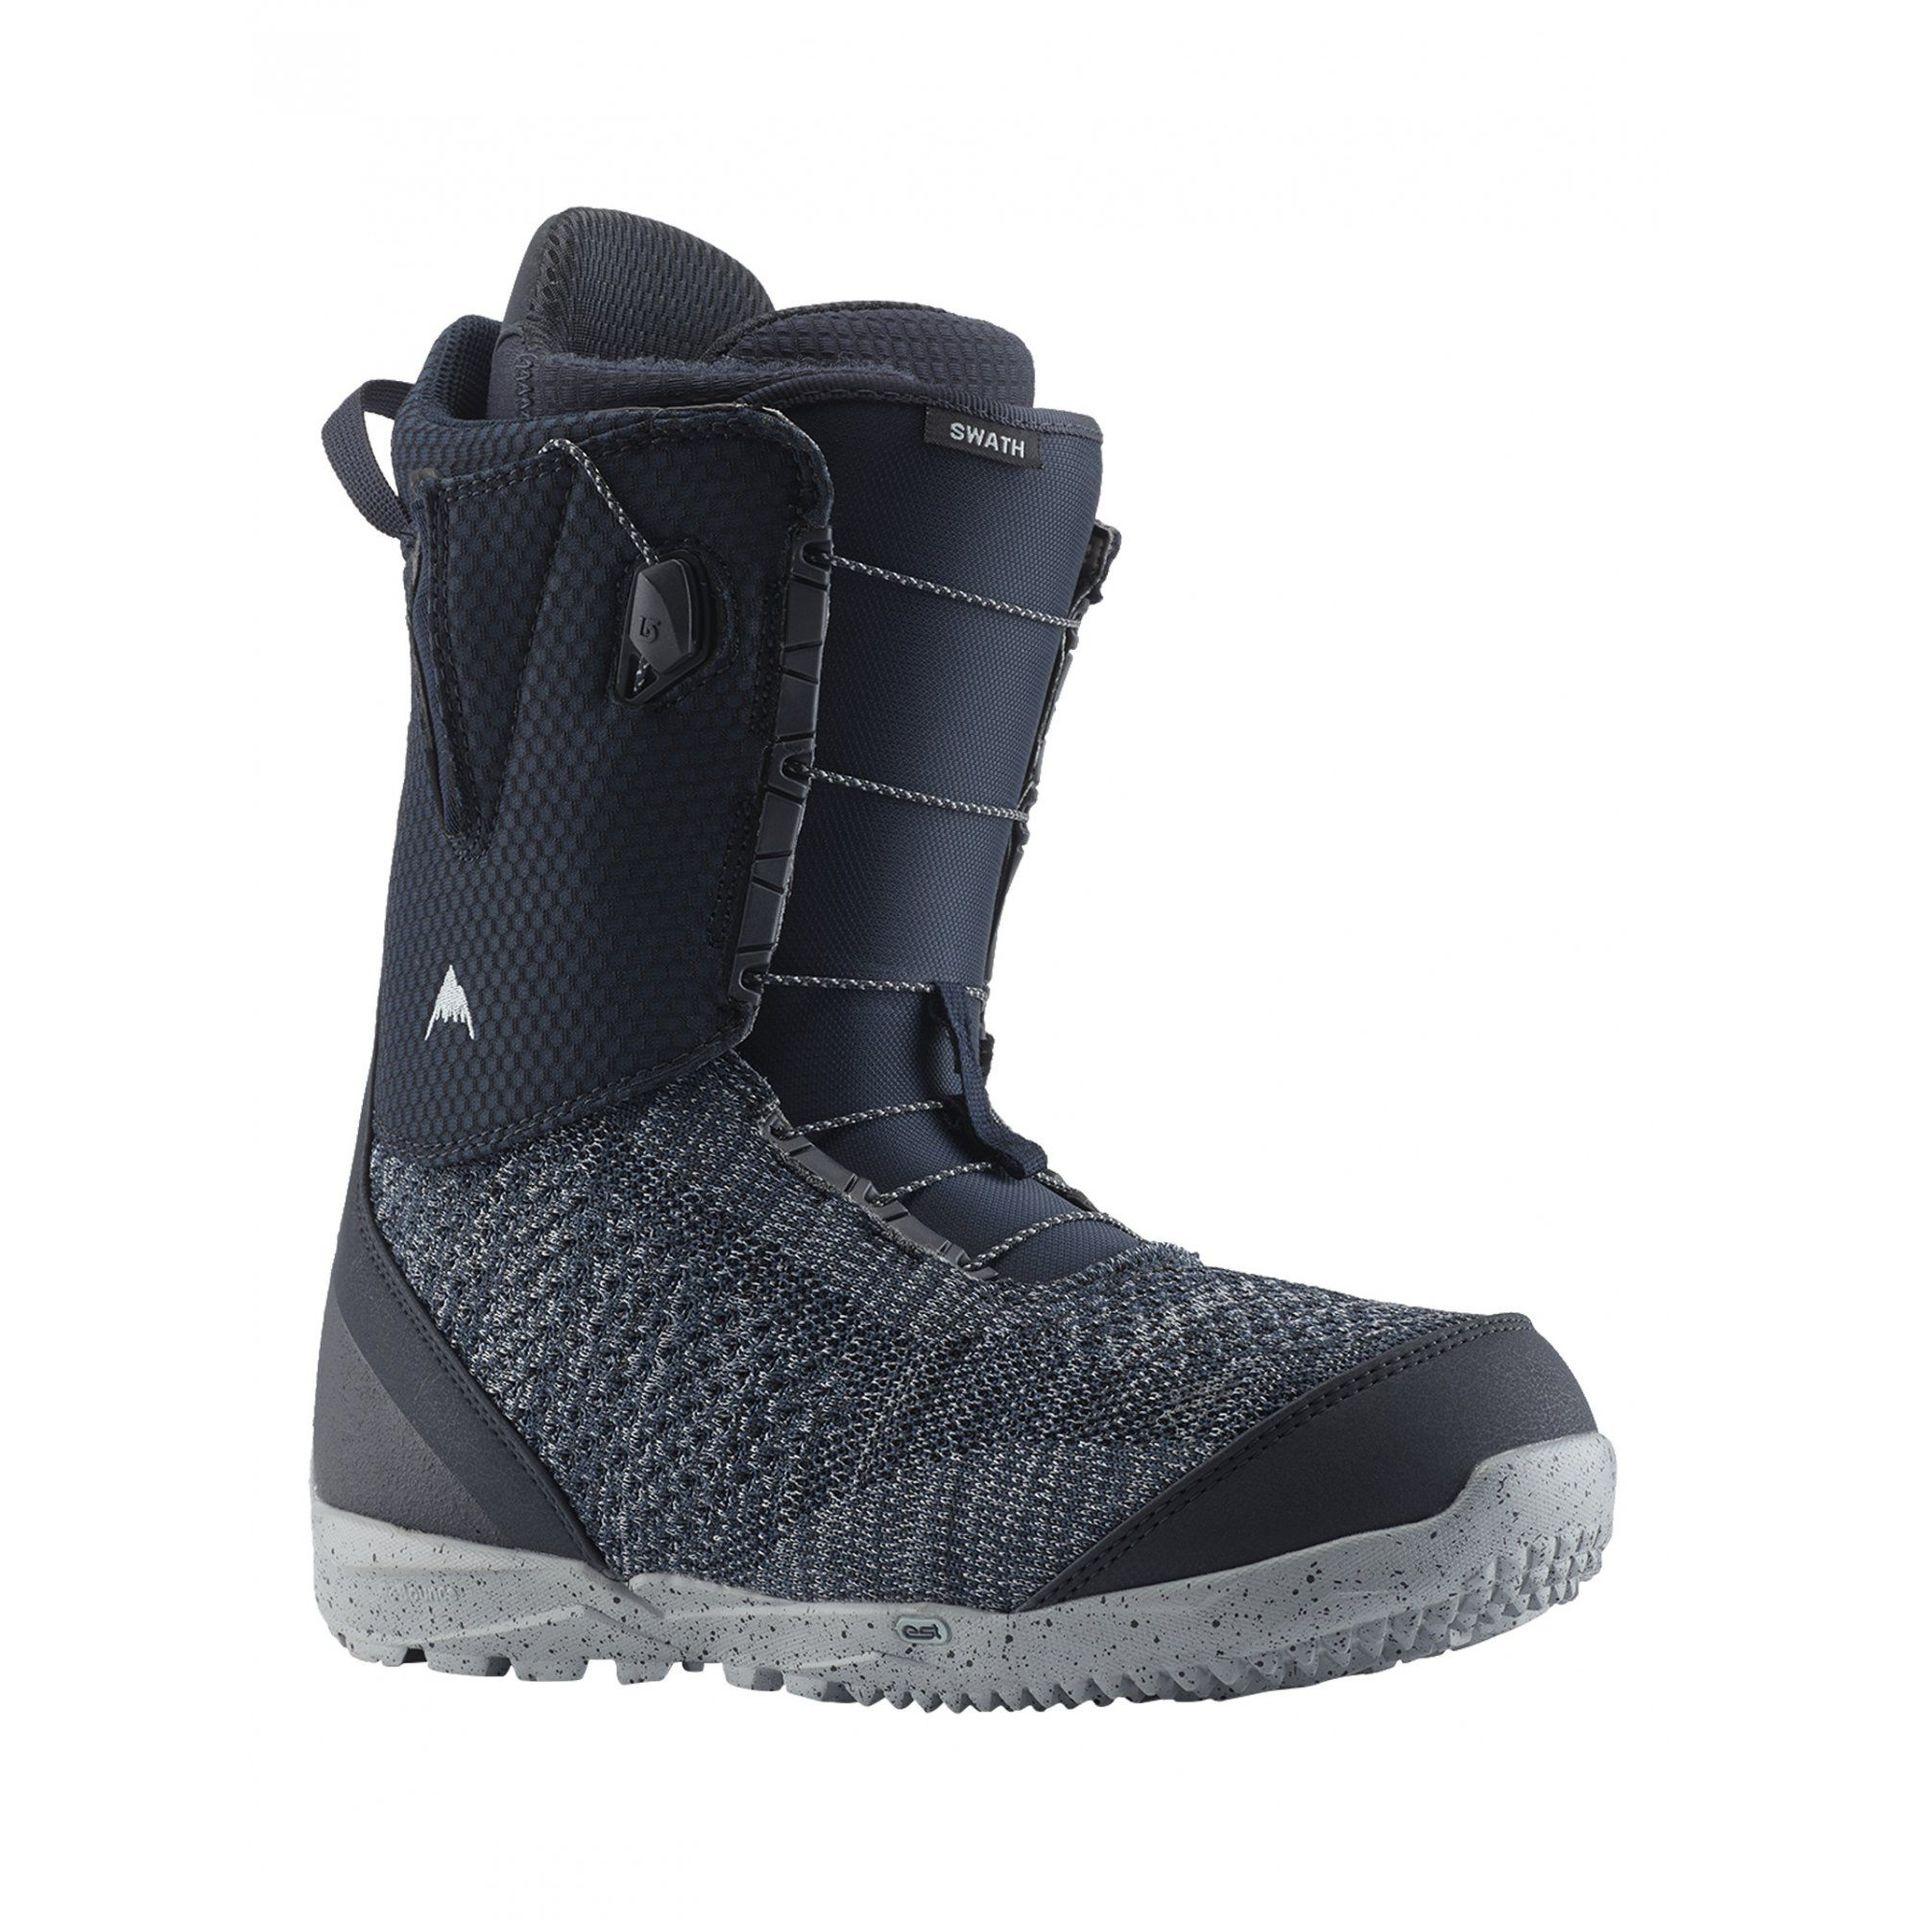 BUTY SNOWBOARDOWE BURTON SWATH FOG 203161-042 1